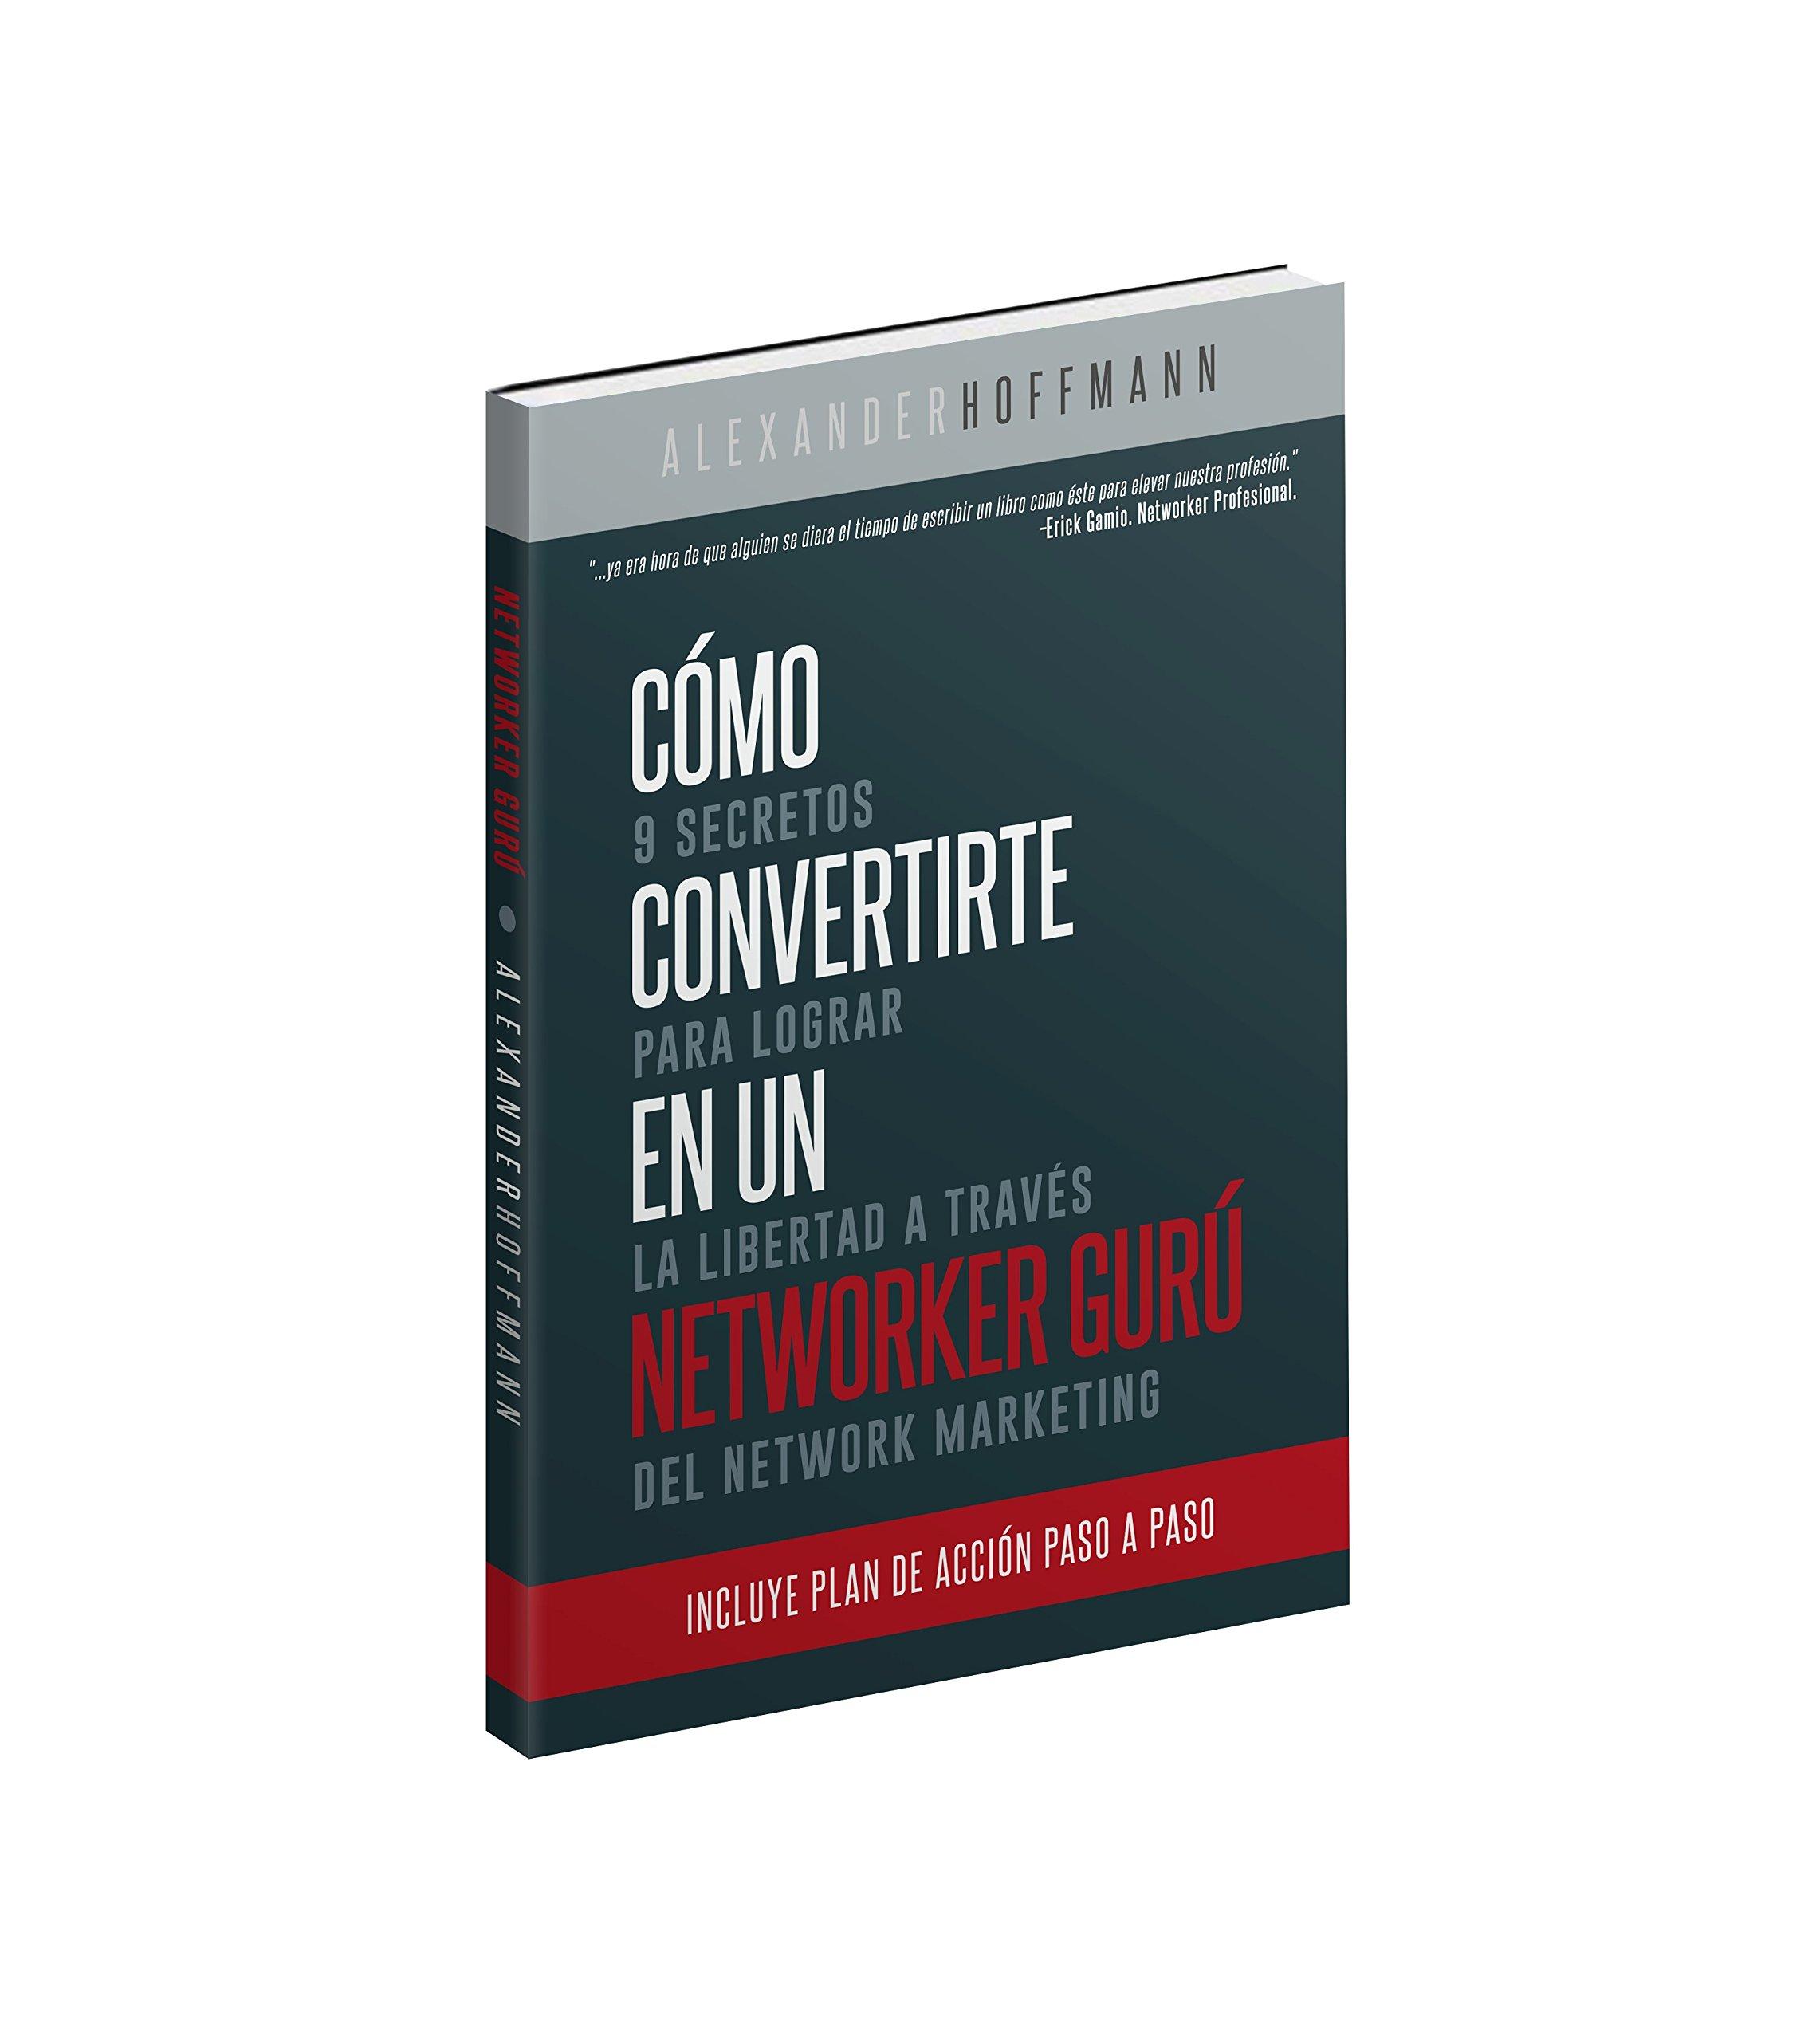 Como Convertirse en un Networker Guru: Alexander Hoffmann: 9780998872506: Amazon.com: Books